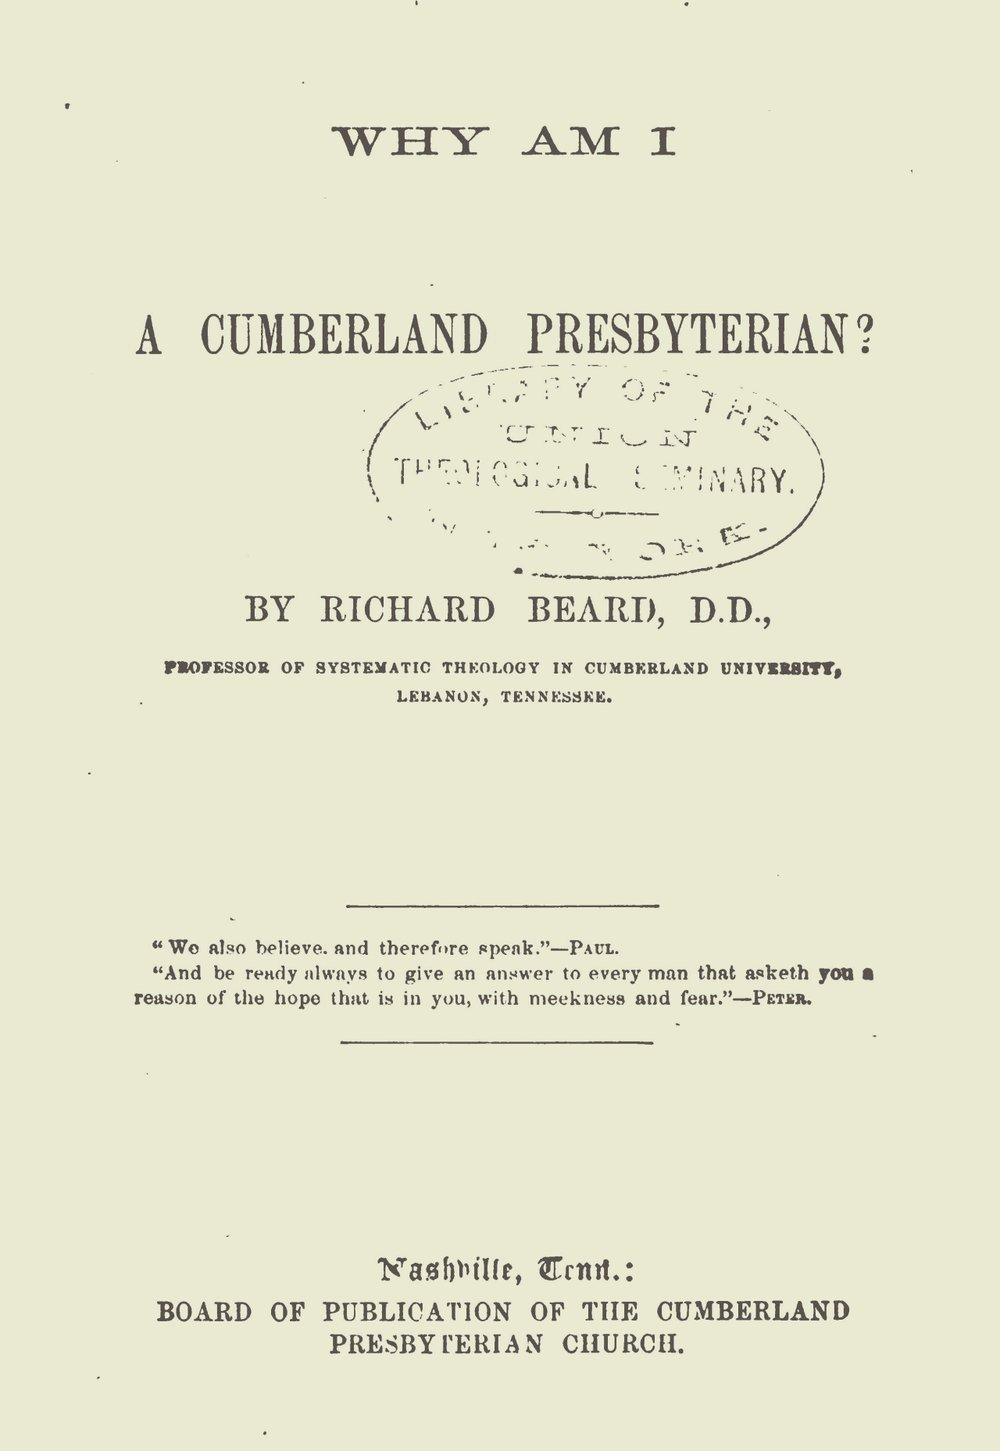 Beard, Richard, Why Am I a Cumberland Presbyterian Title Page.jpg